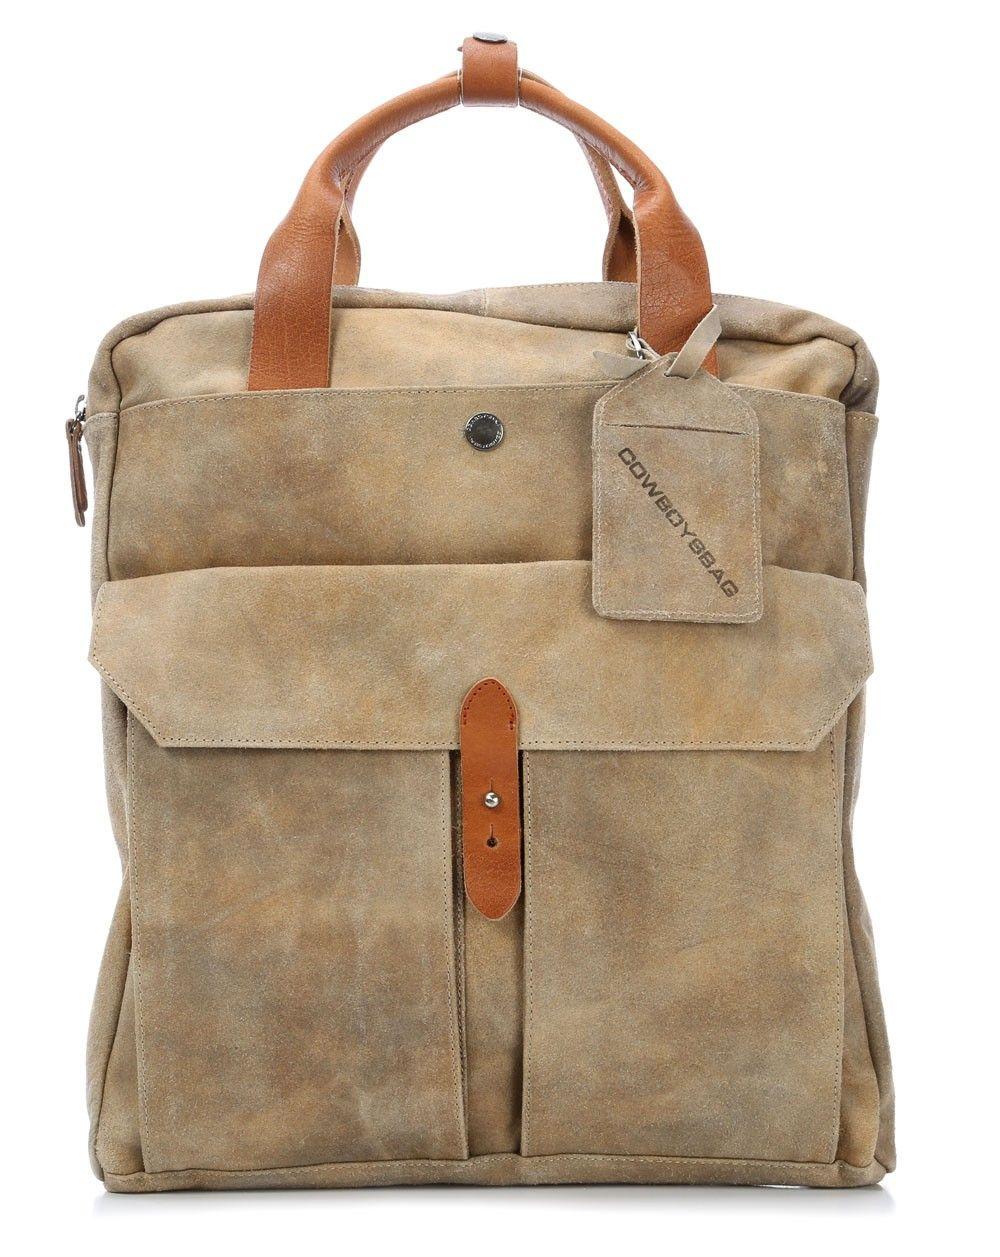 Cowboysbag spencer rucksack leder khaki 40 - Wardow handtaschen ...